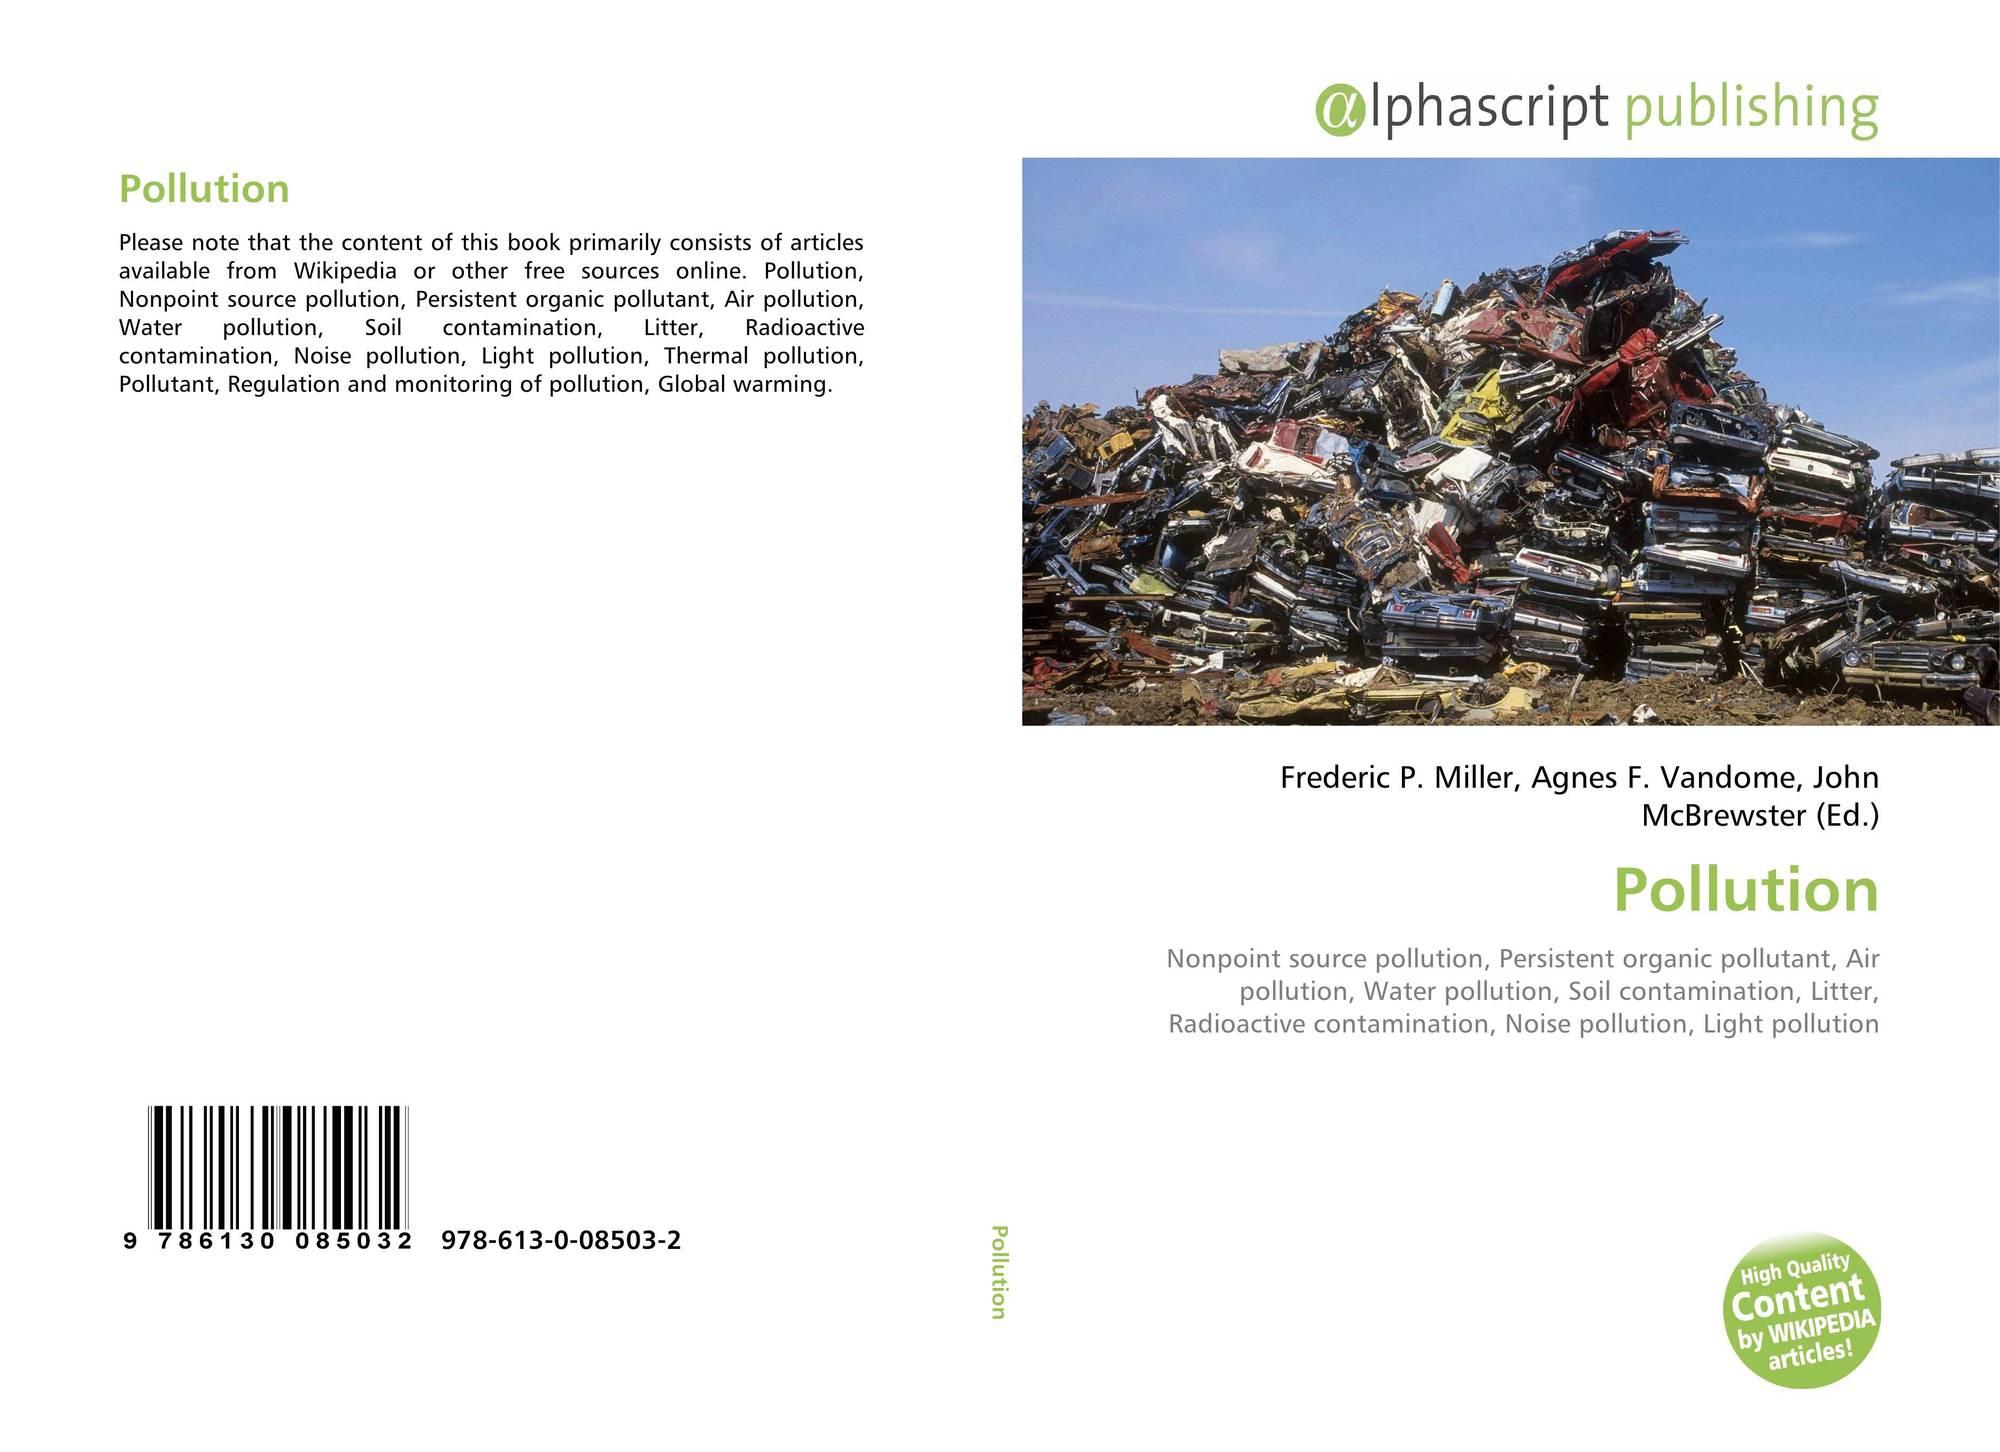 Pollution, 978-613-0-08503-2, 6130085036 ,9786130085032